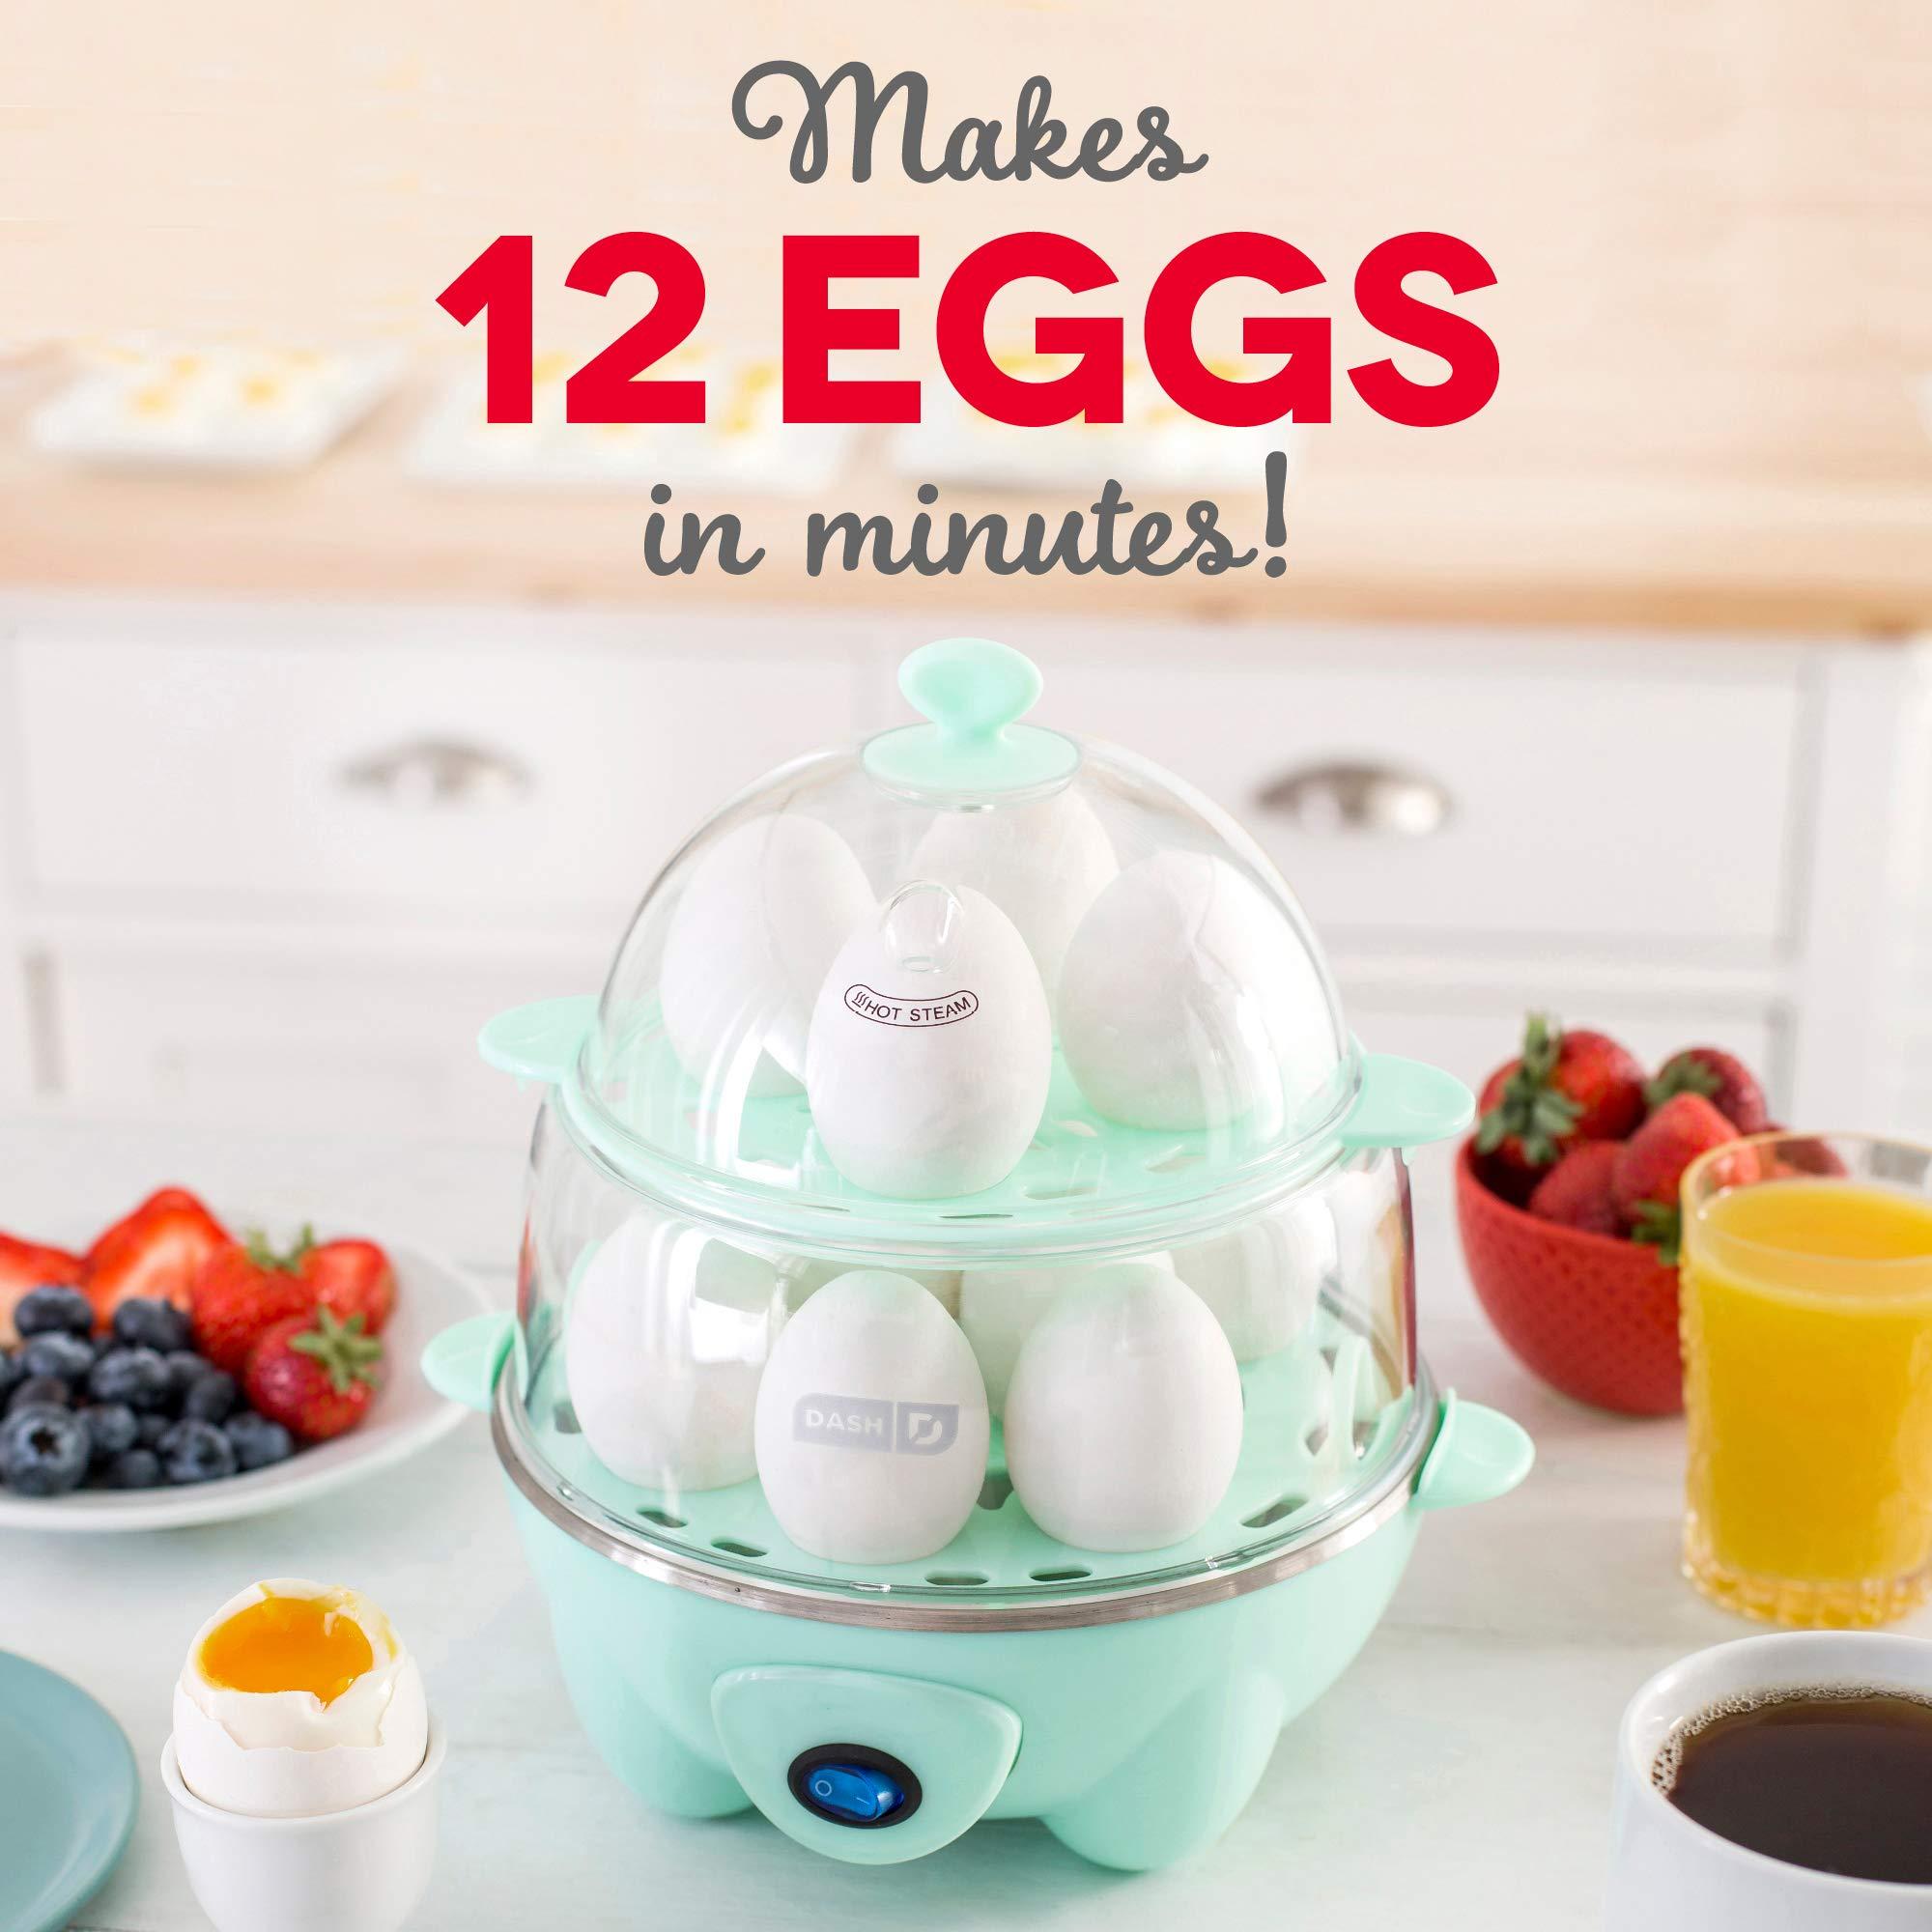 Dash Deluxe Rapid Egg Cooker: 12 Egg Capacity Electric Egg